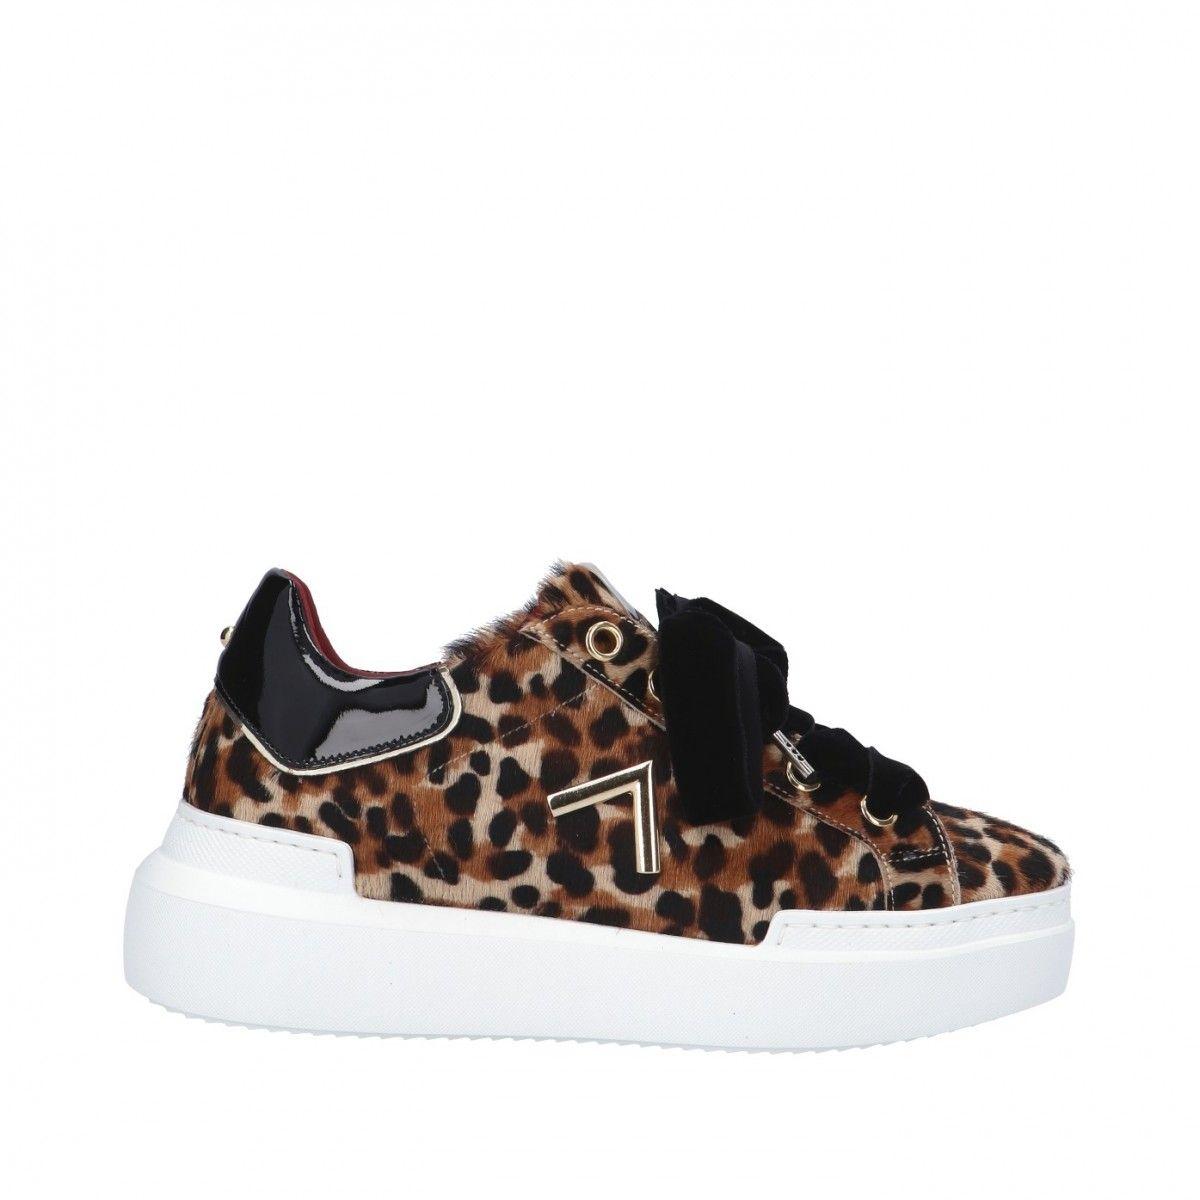 Ed parrish Sneaker Animalier Gomma CKLD-CL03